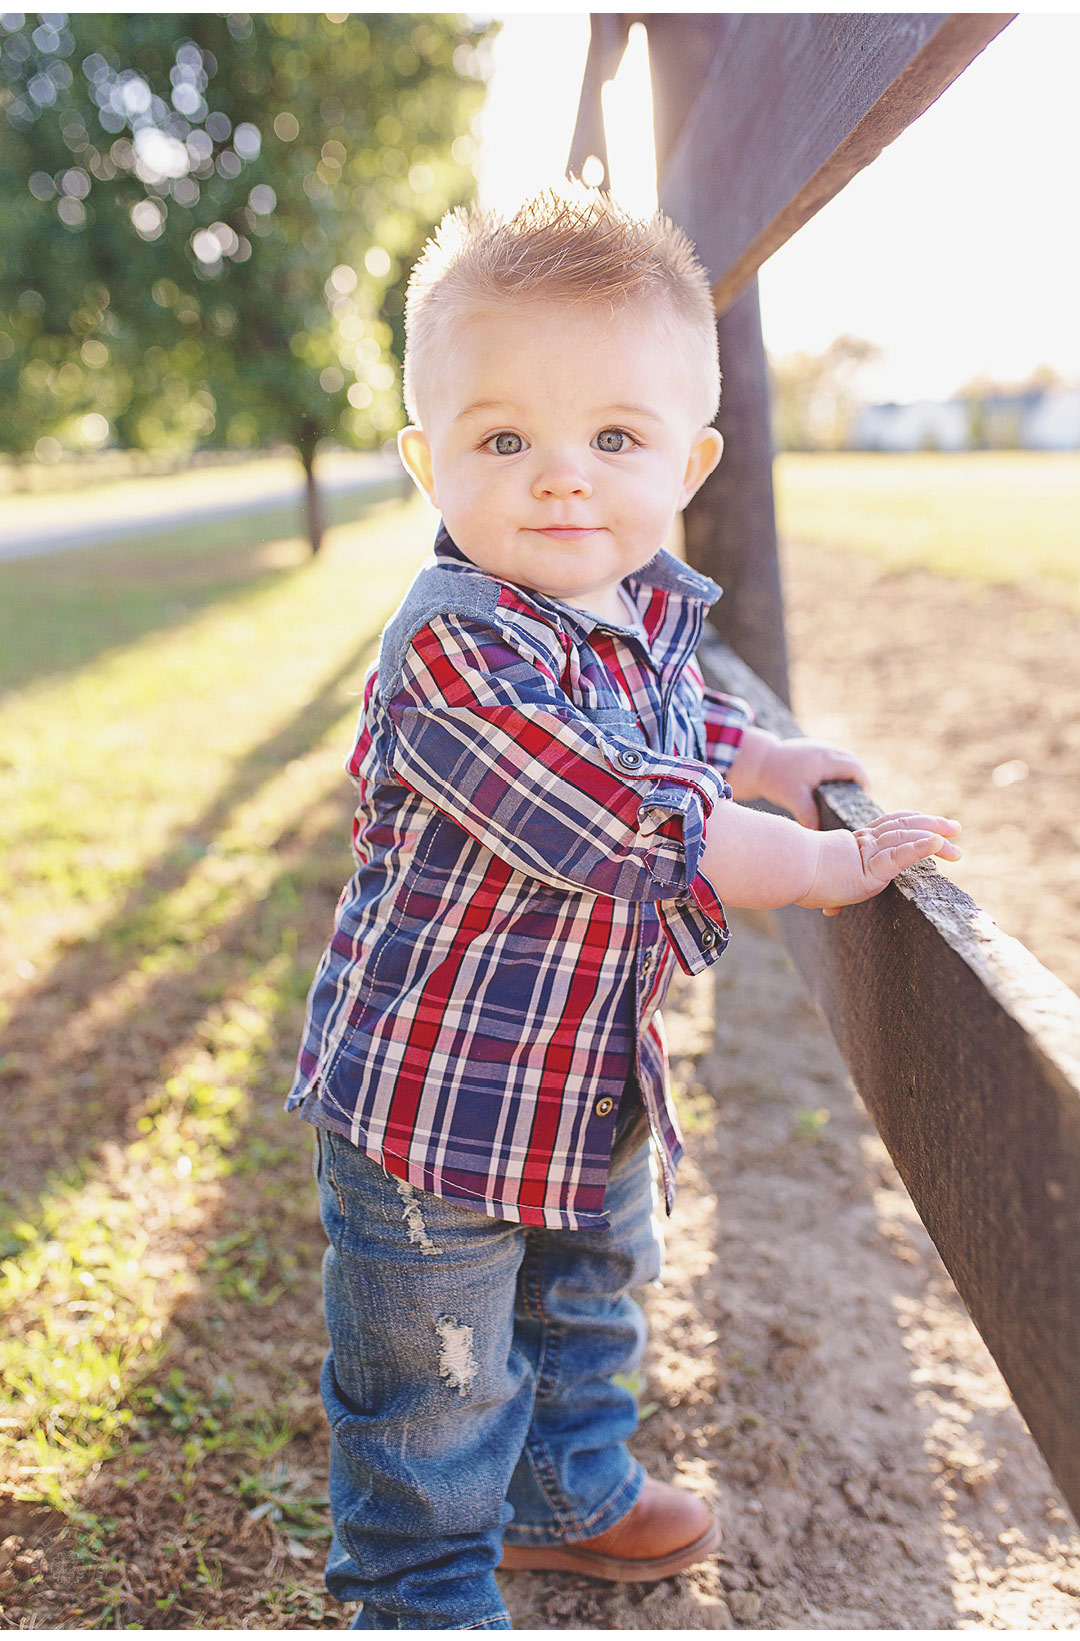 pierson-2015-dayton-family-children-photography-4.jpg